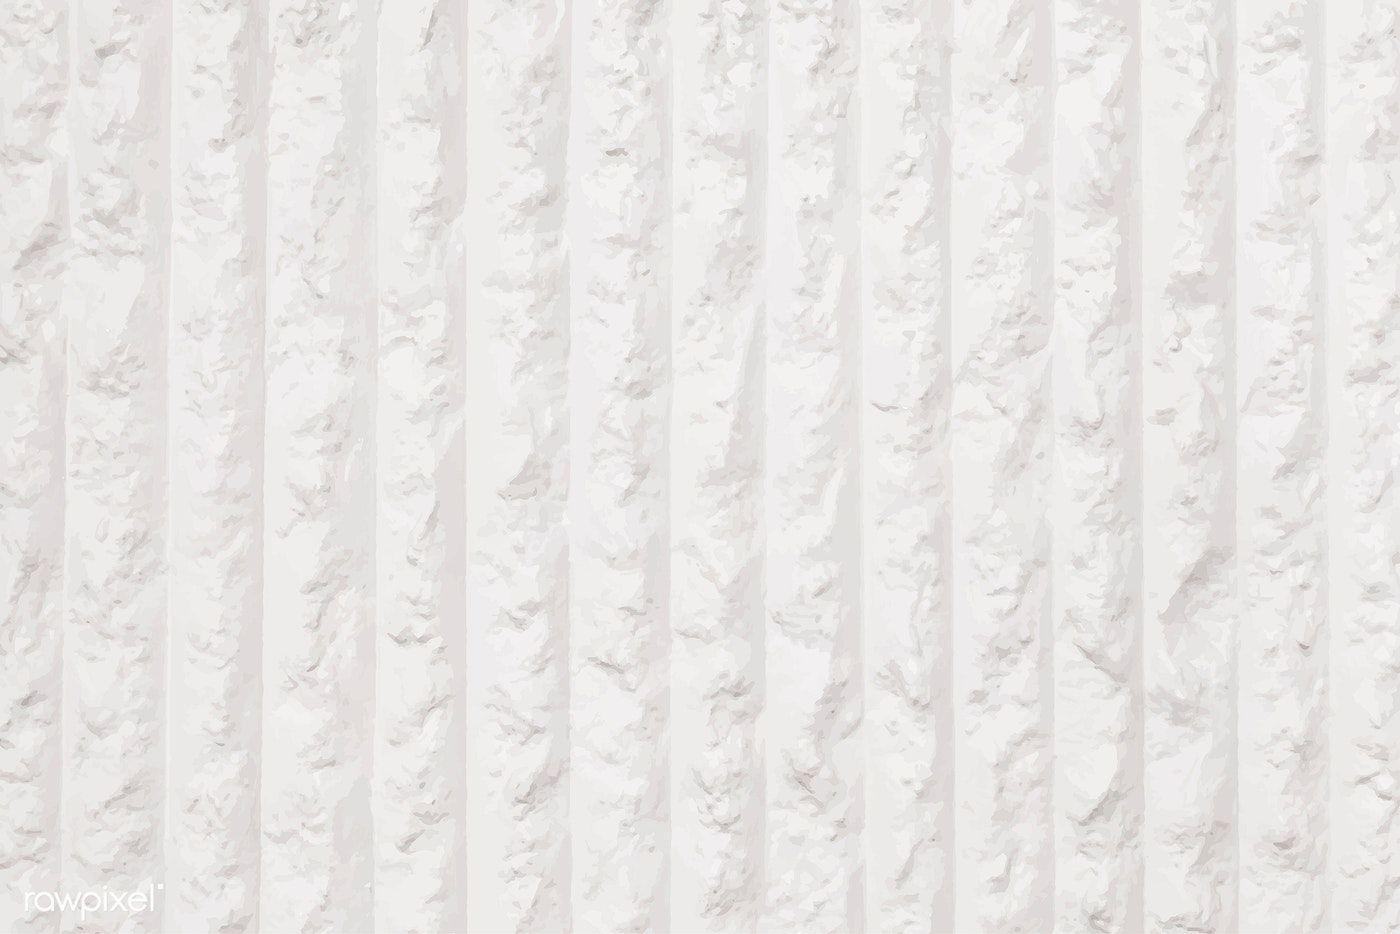 Pastel beige striped concrete wall textured background